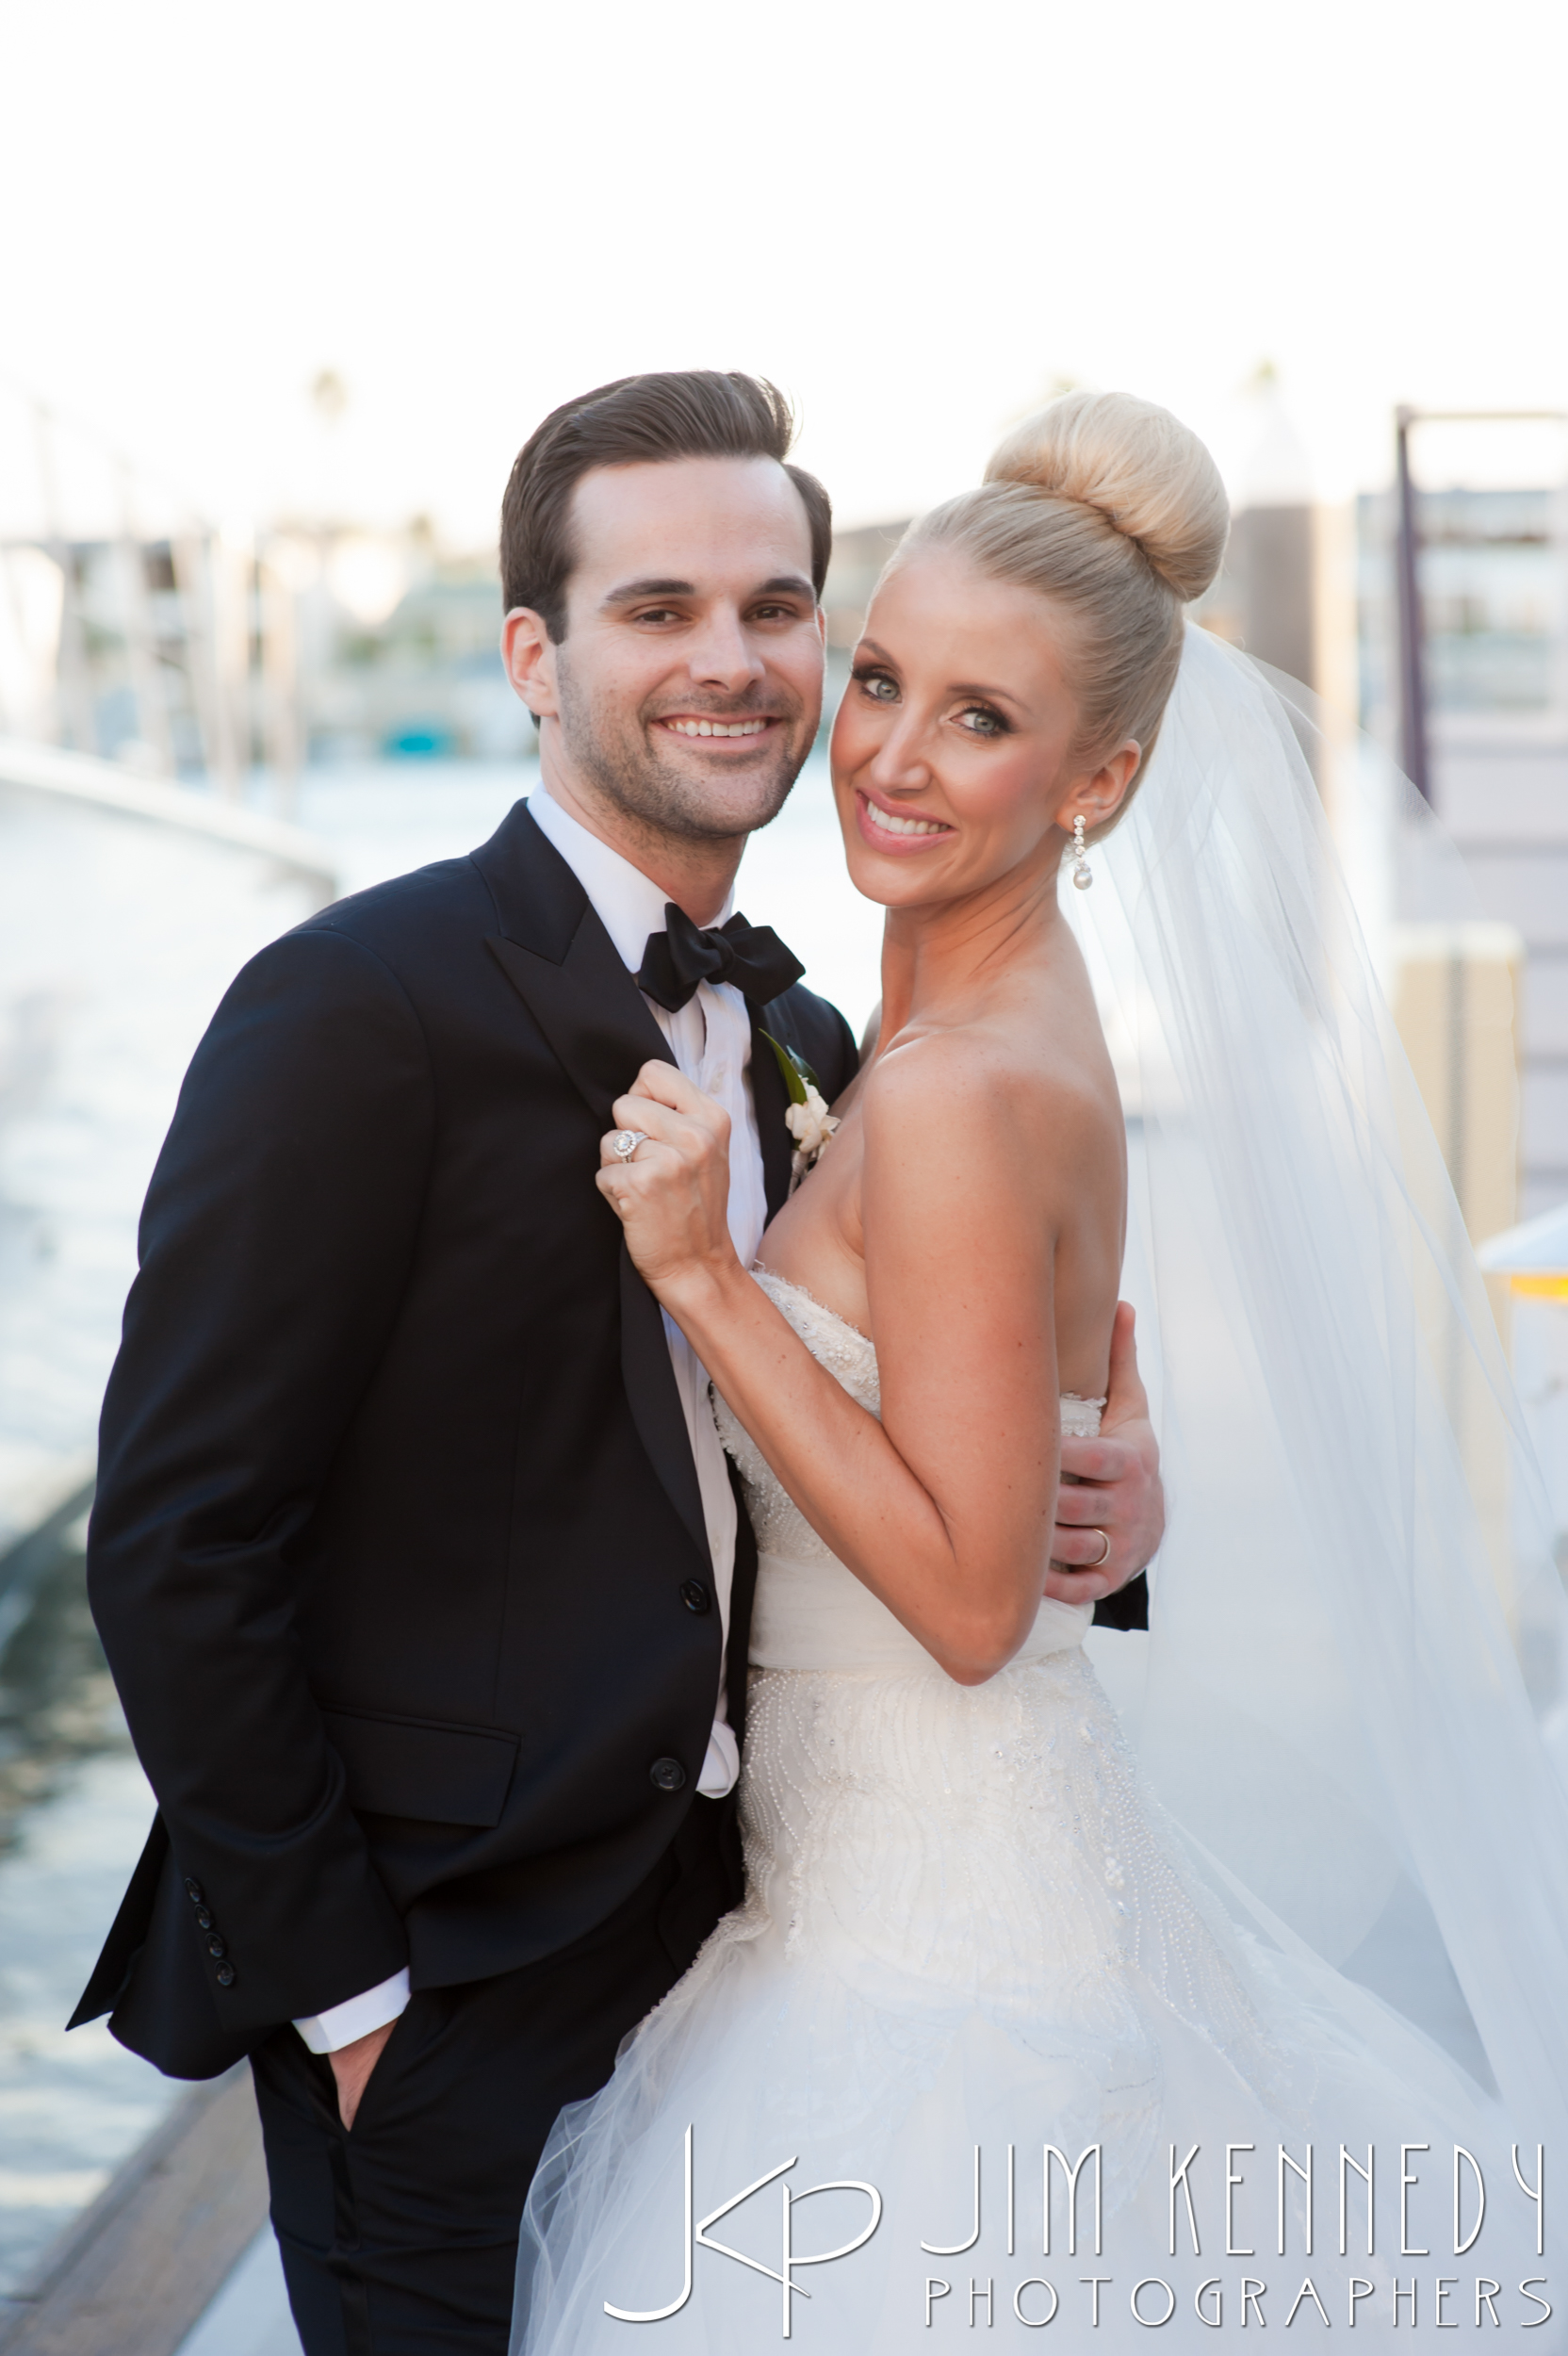 balboa-bay-resort-wedding-photography_0162.JPG